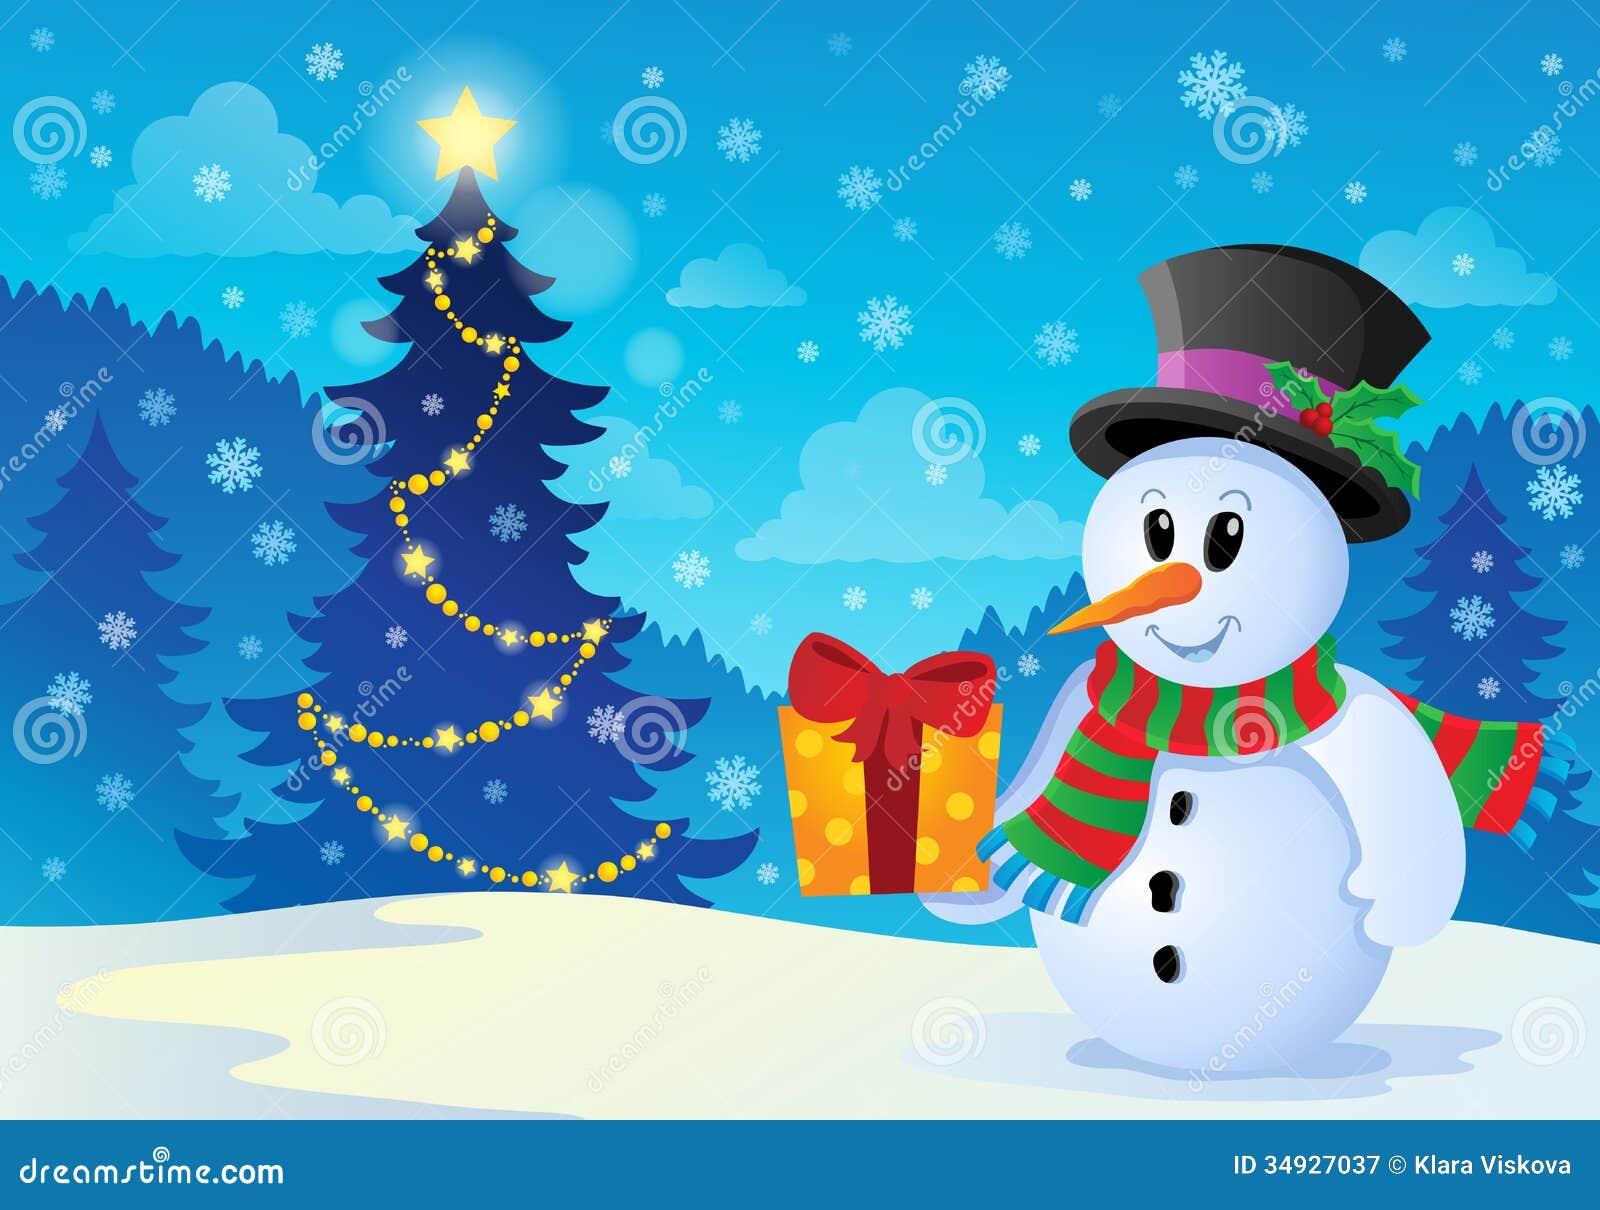 Christmas Snowman Theme Image 1 Royalty Free Stock